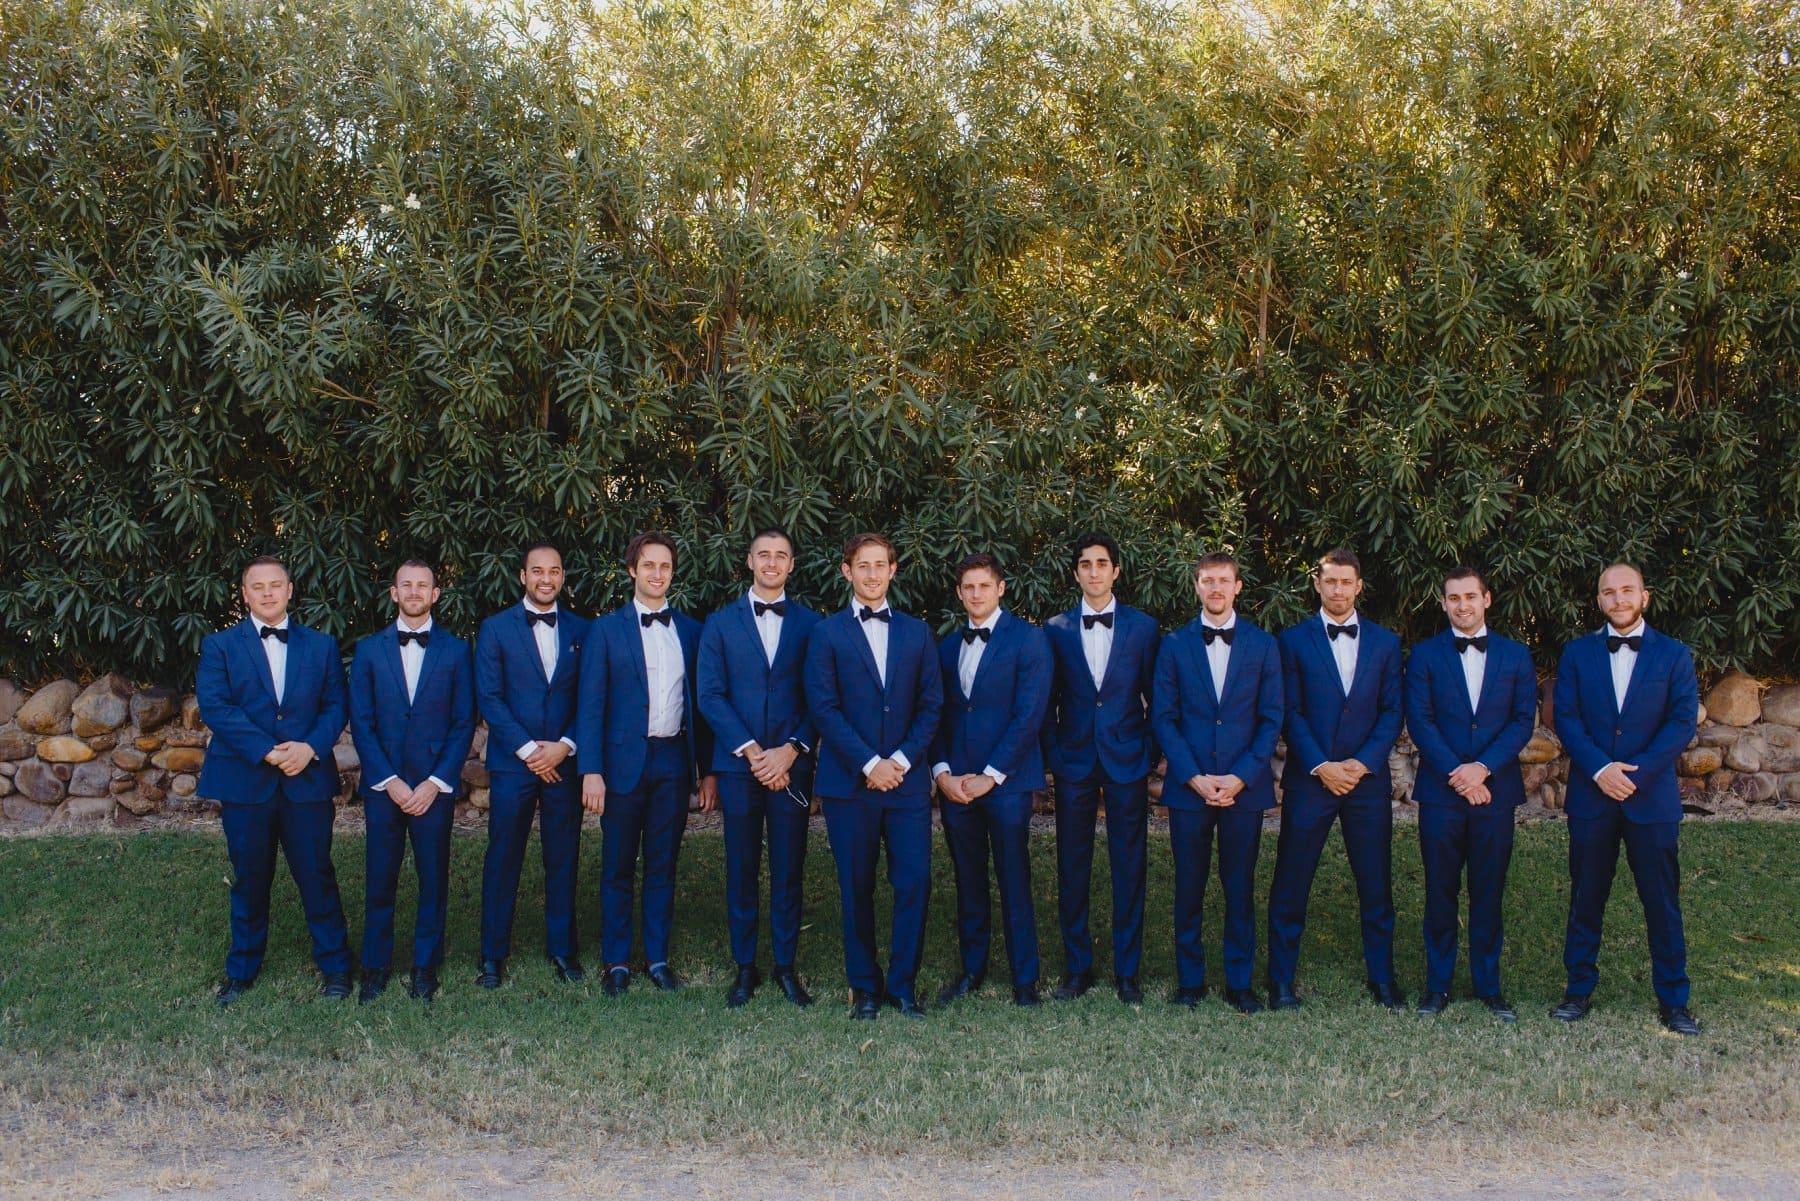 groom & groomsmen at Saguaro Lake Ranch wedding blue suits and bowties